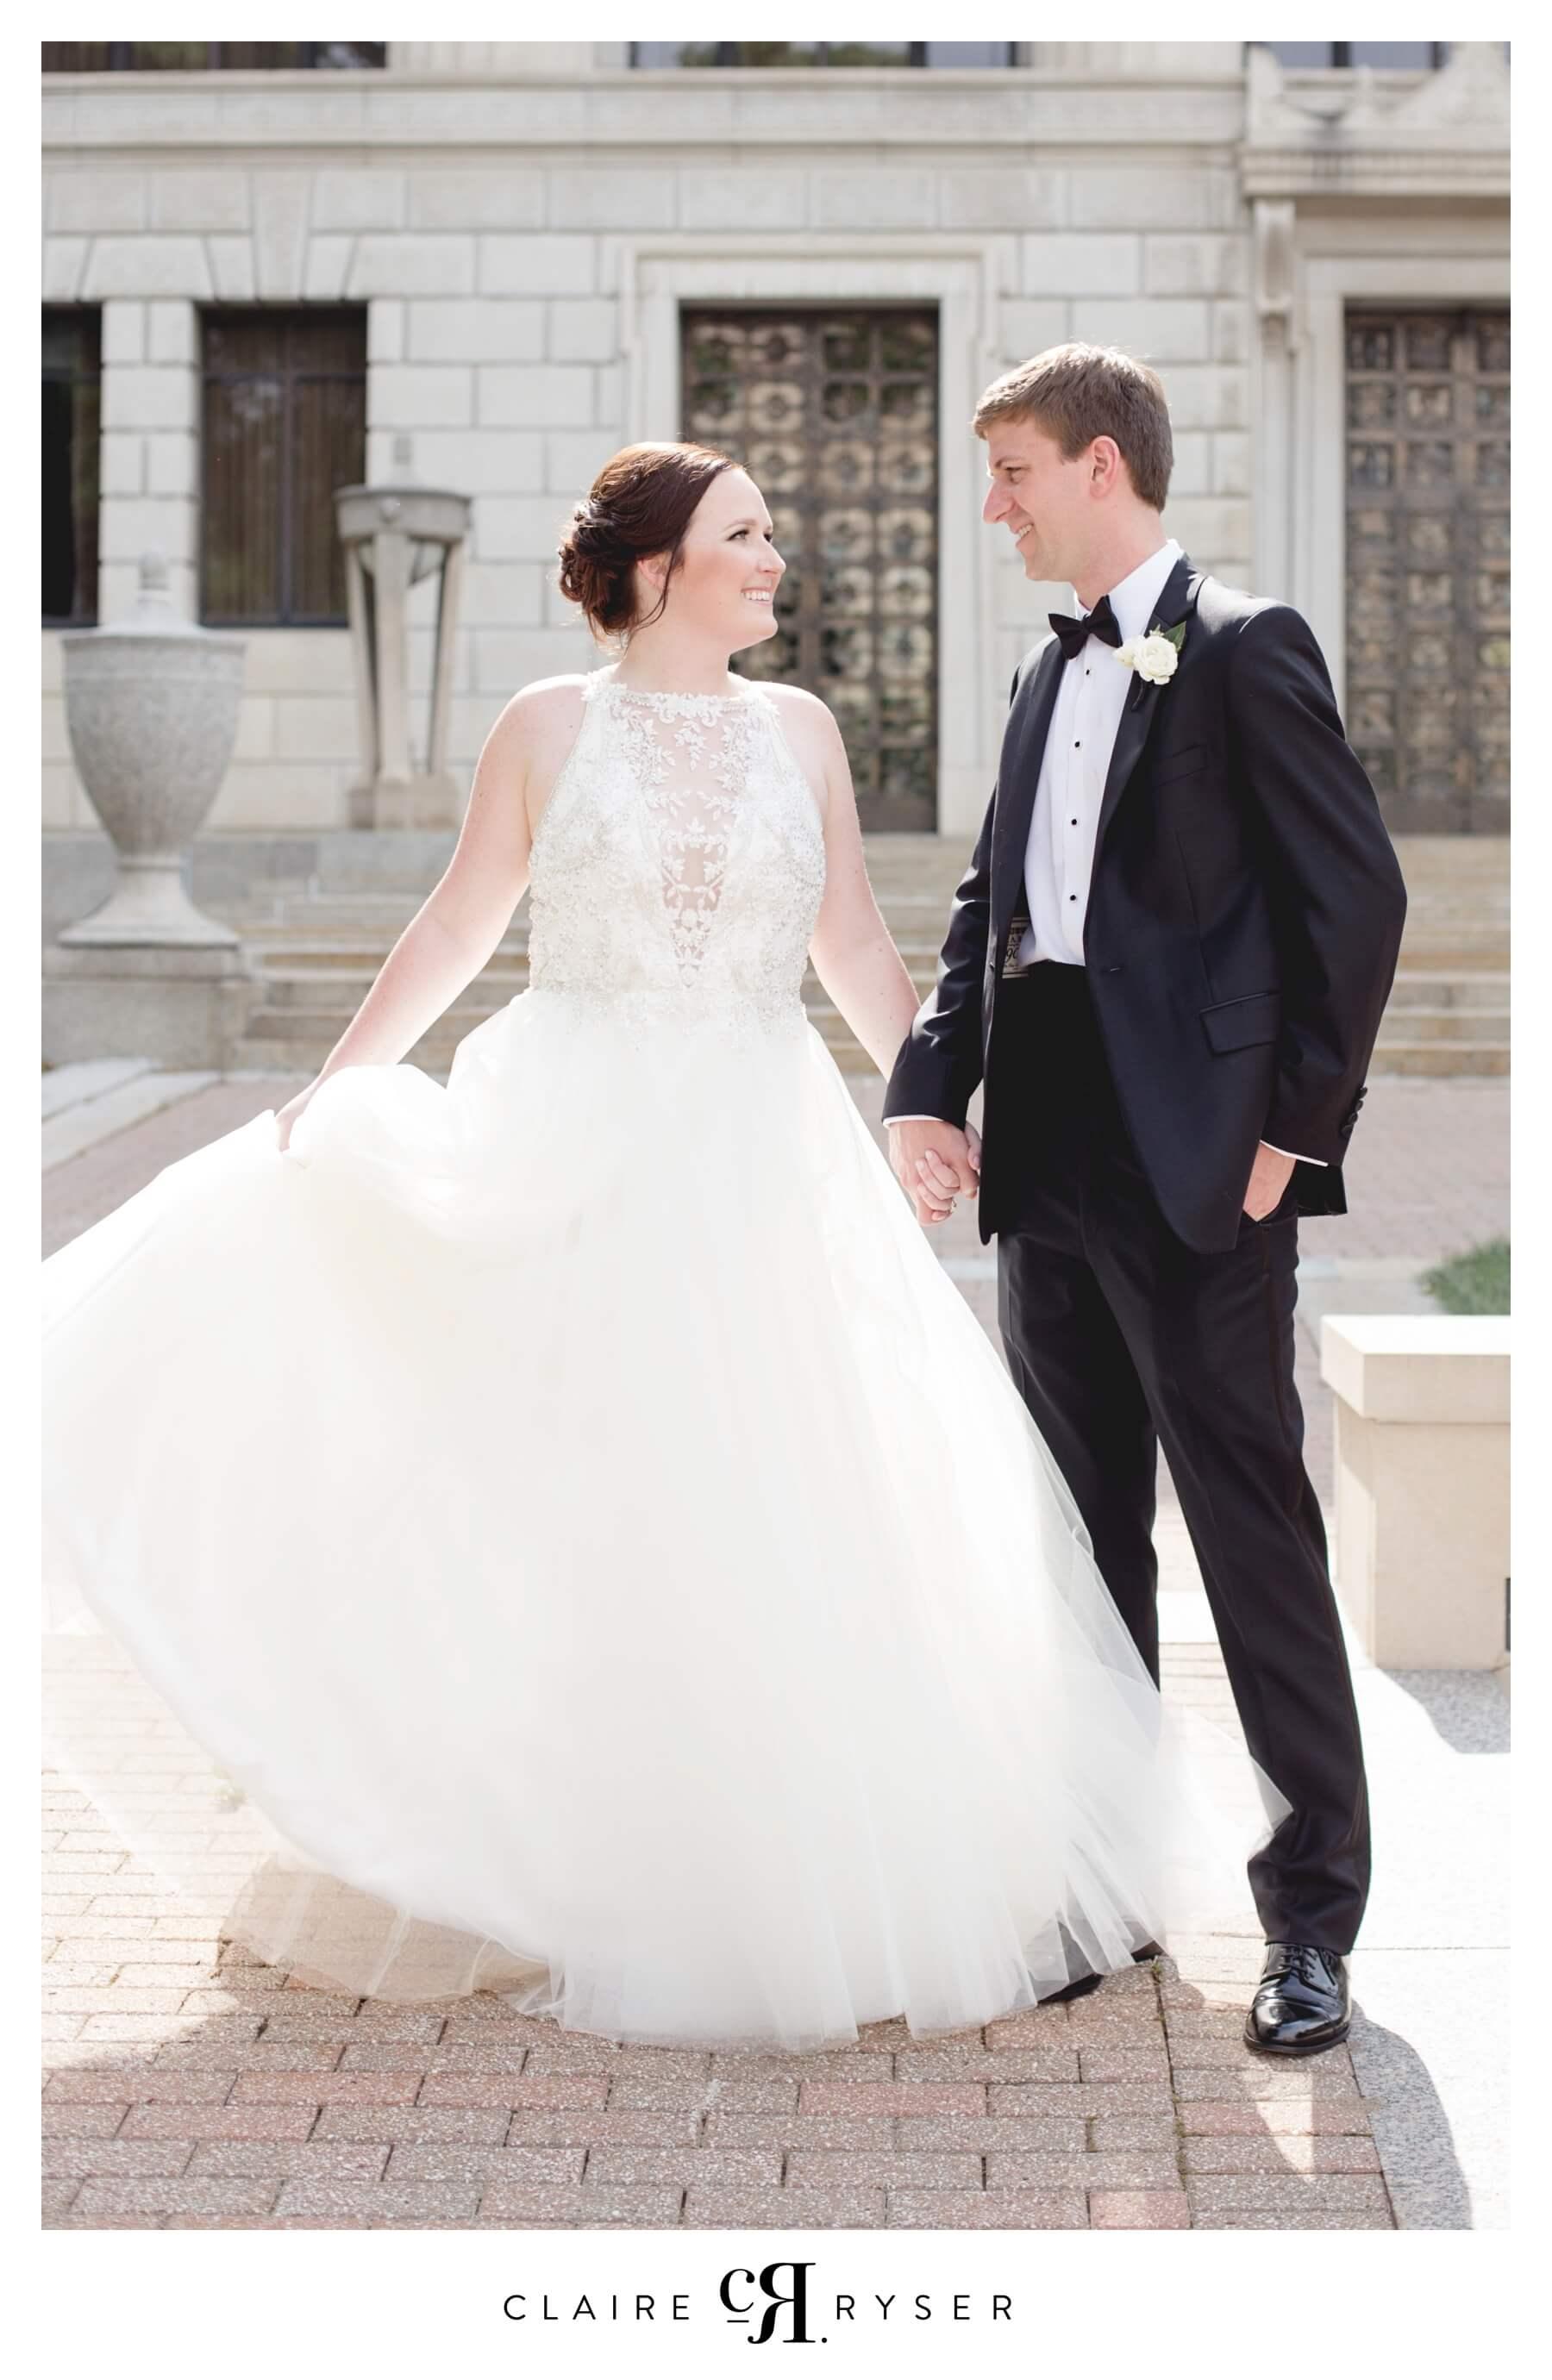 Claire and David Wedding Blog 16.jpg